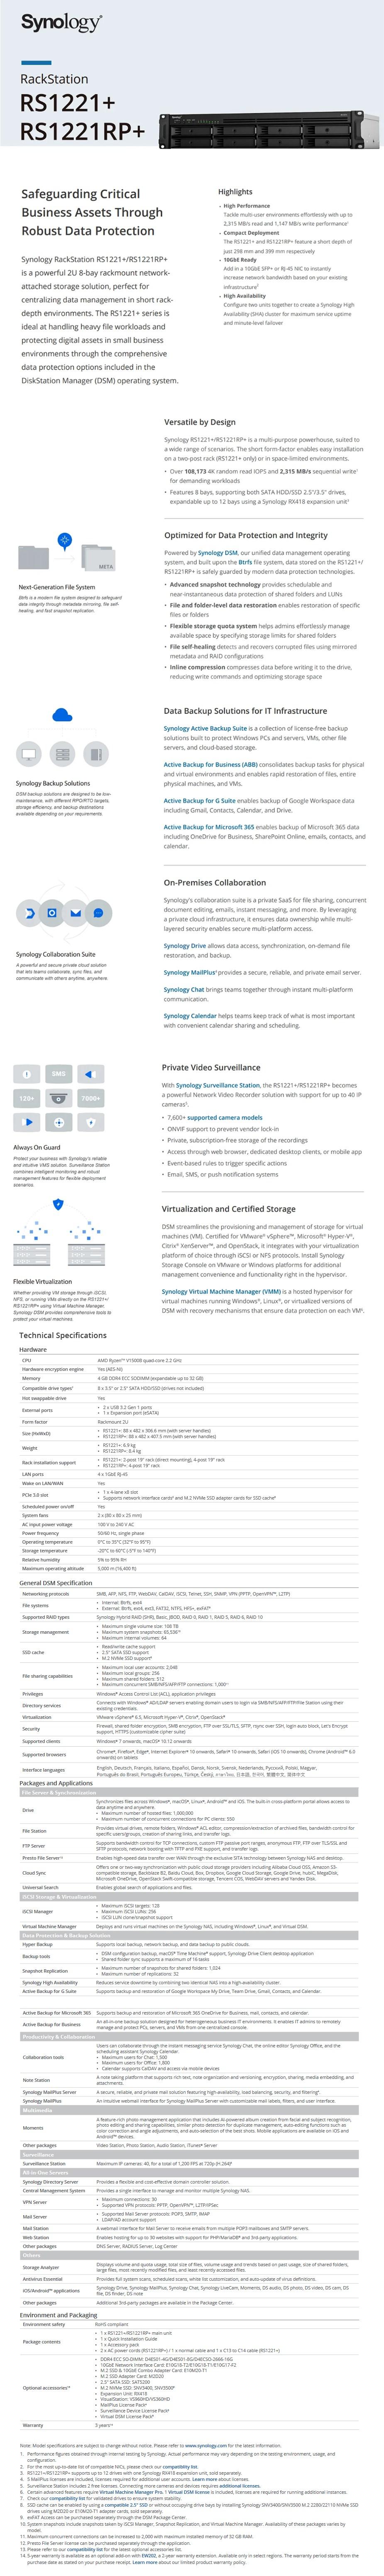 Synology Diskstation RS1221RP+ 8-Bay Diskless NAS Quad Core 2.2GHz 4GB - Desktop Overview 1